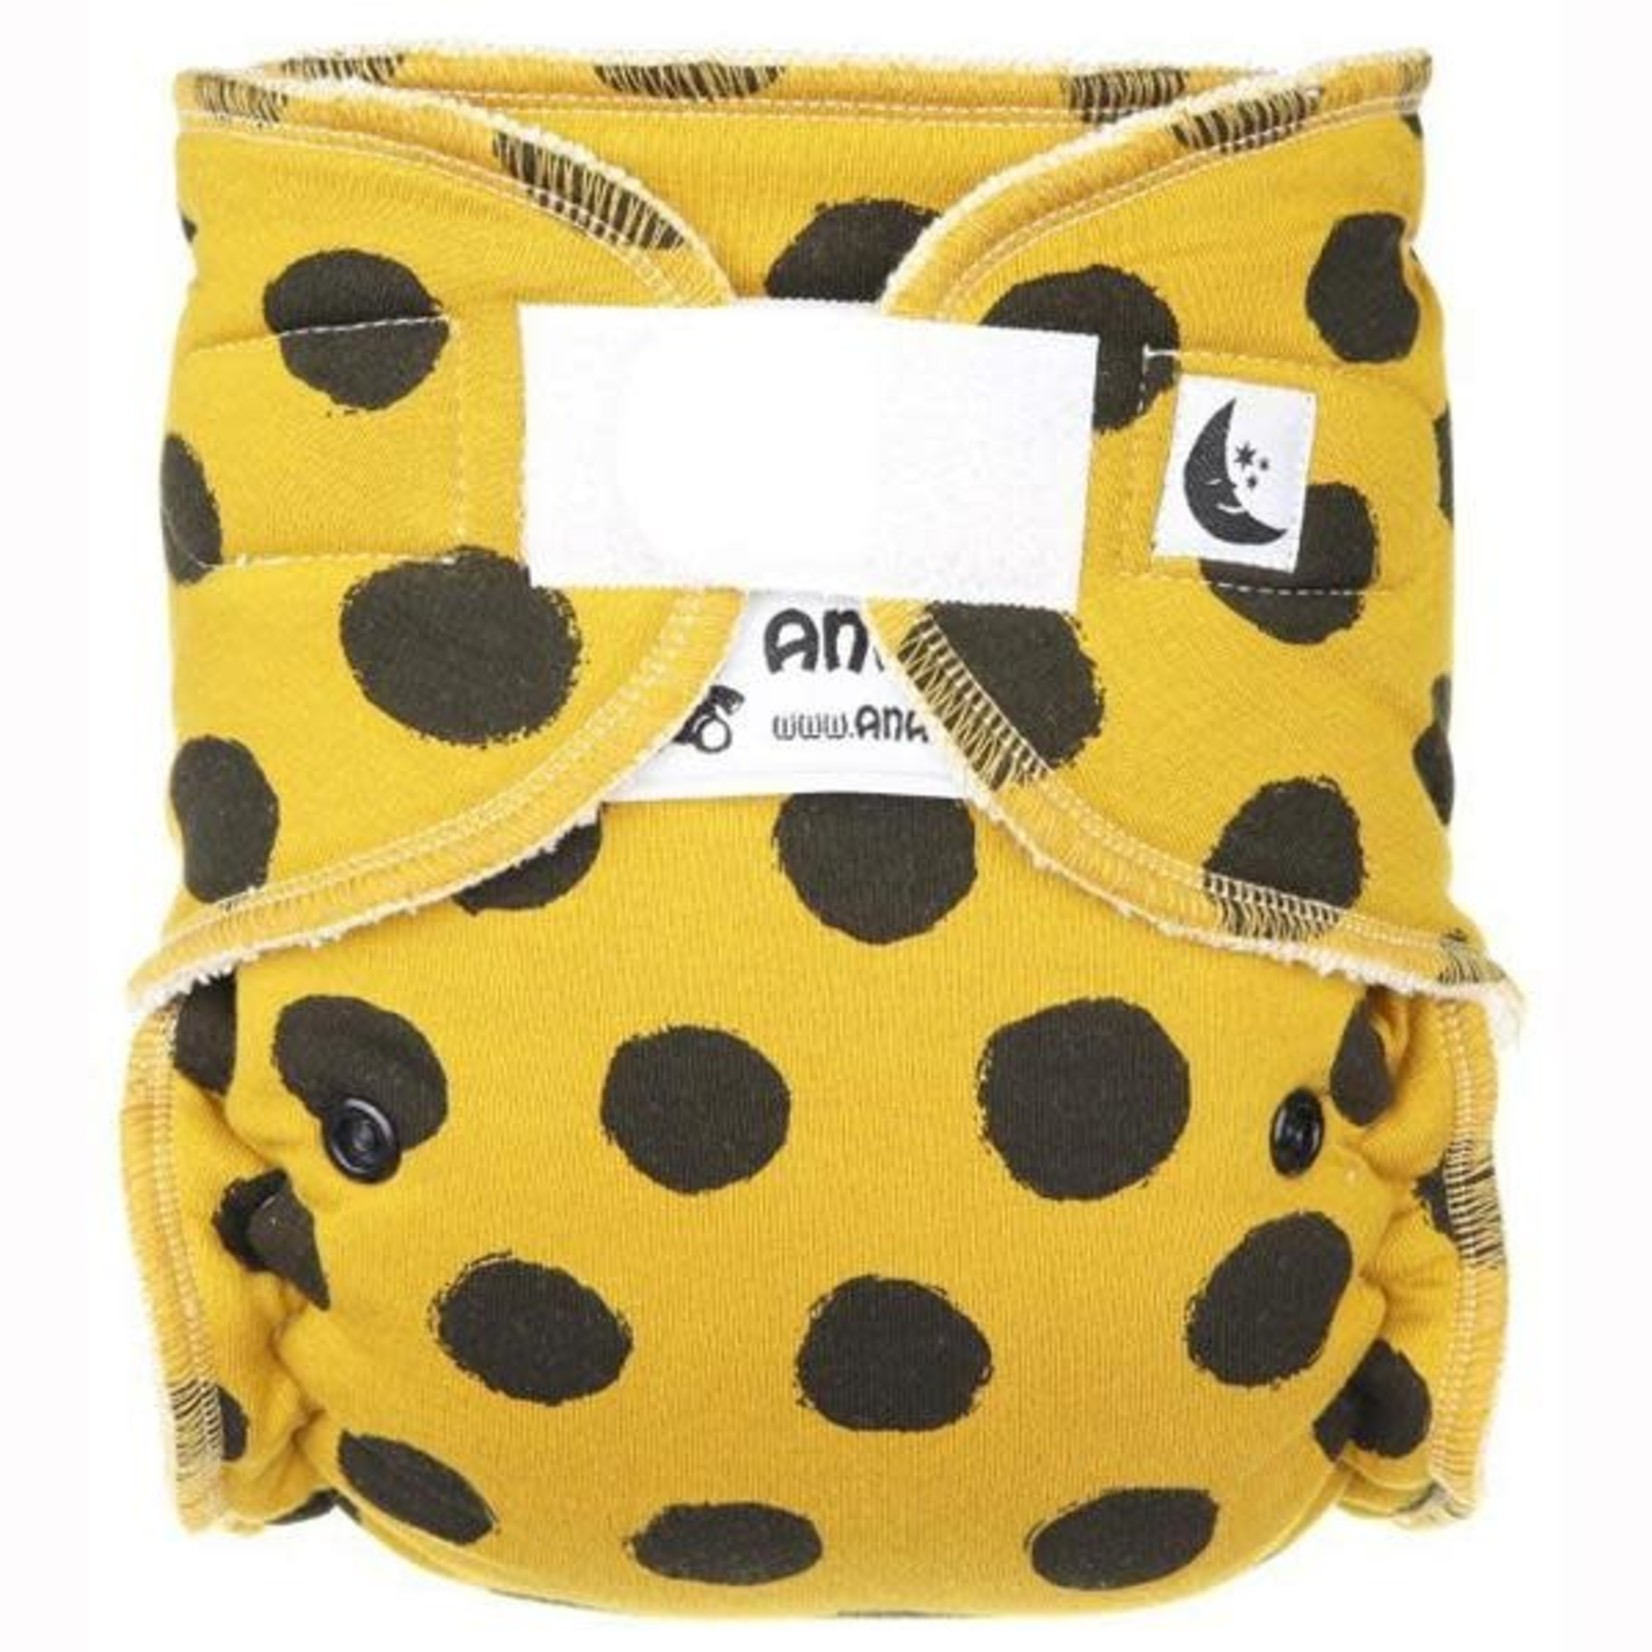 Anavy Nachtluier (Maxi XL) VELCRO - Black dots mustard